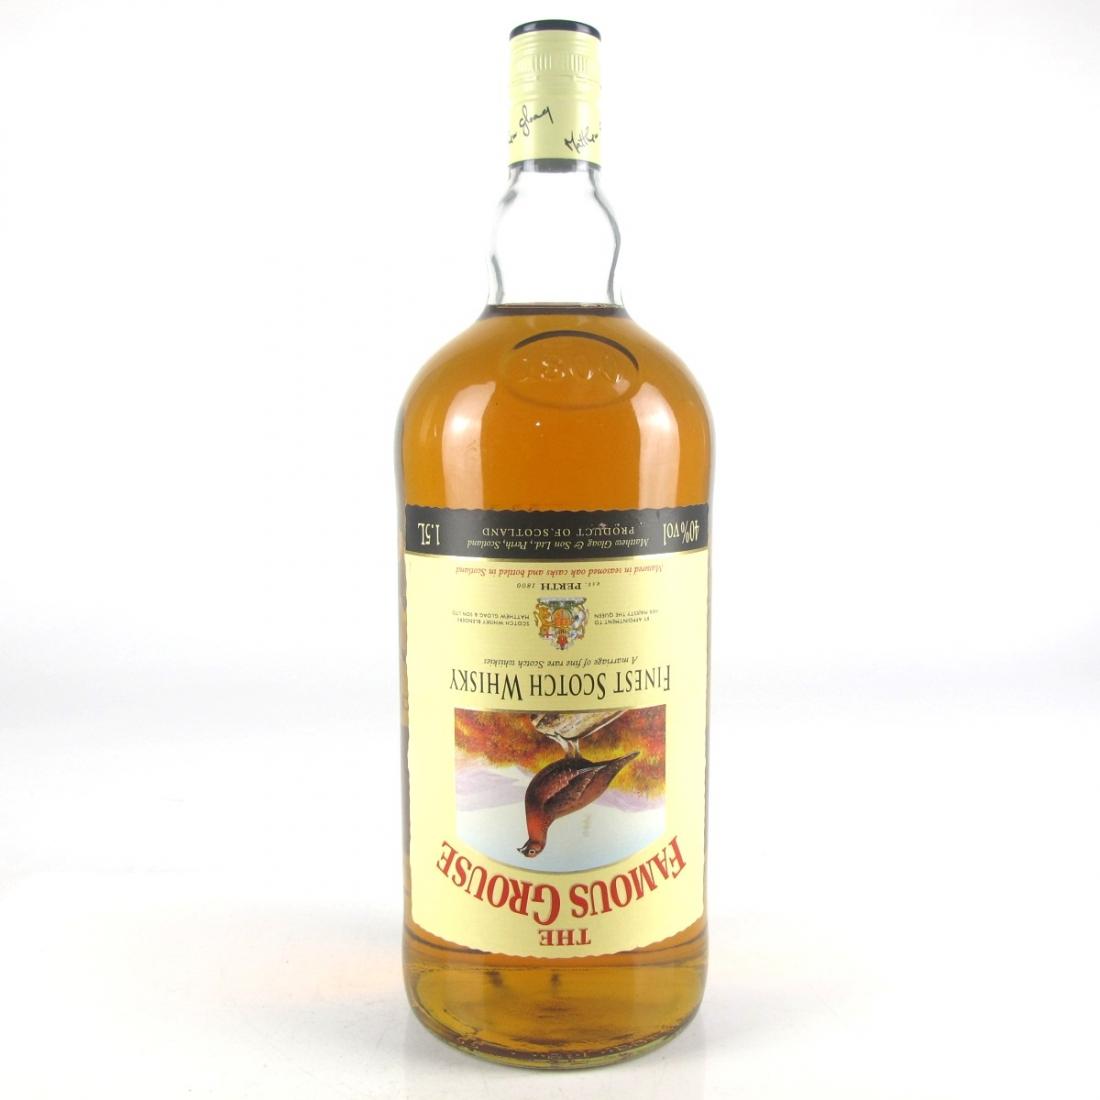 Famous Grouse Scotch Whisky 1.5 Litre